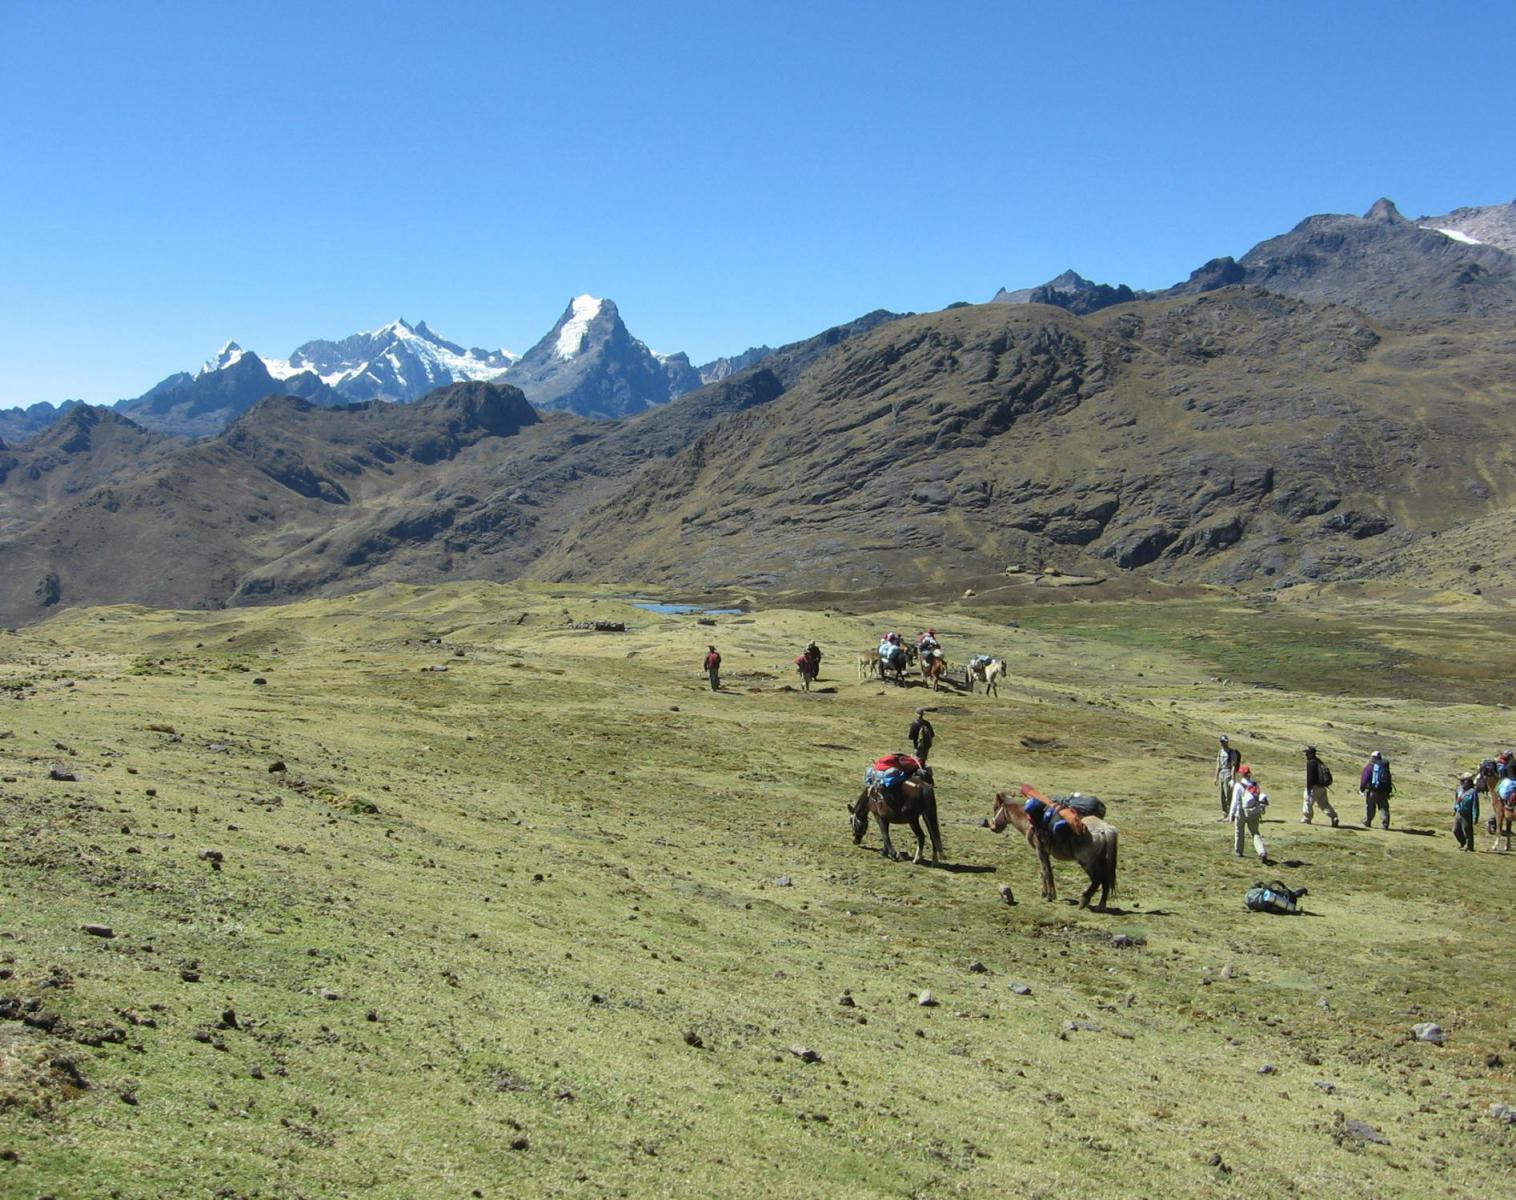 Pérou  Urubamba et Machu Picchu   Découverte & Balade Trek & Randonnée